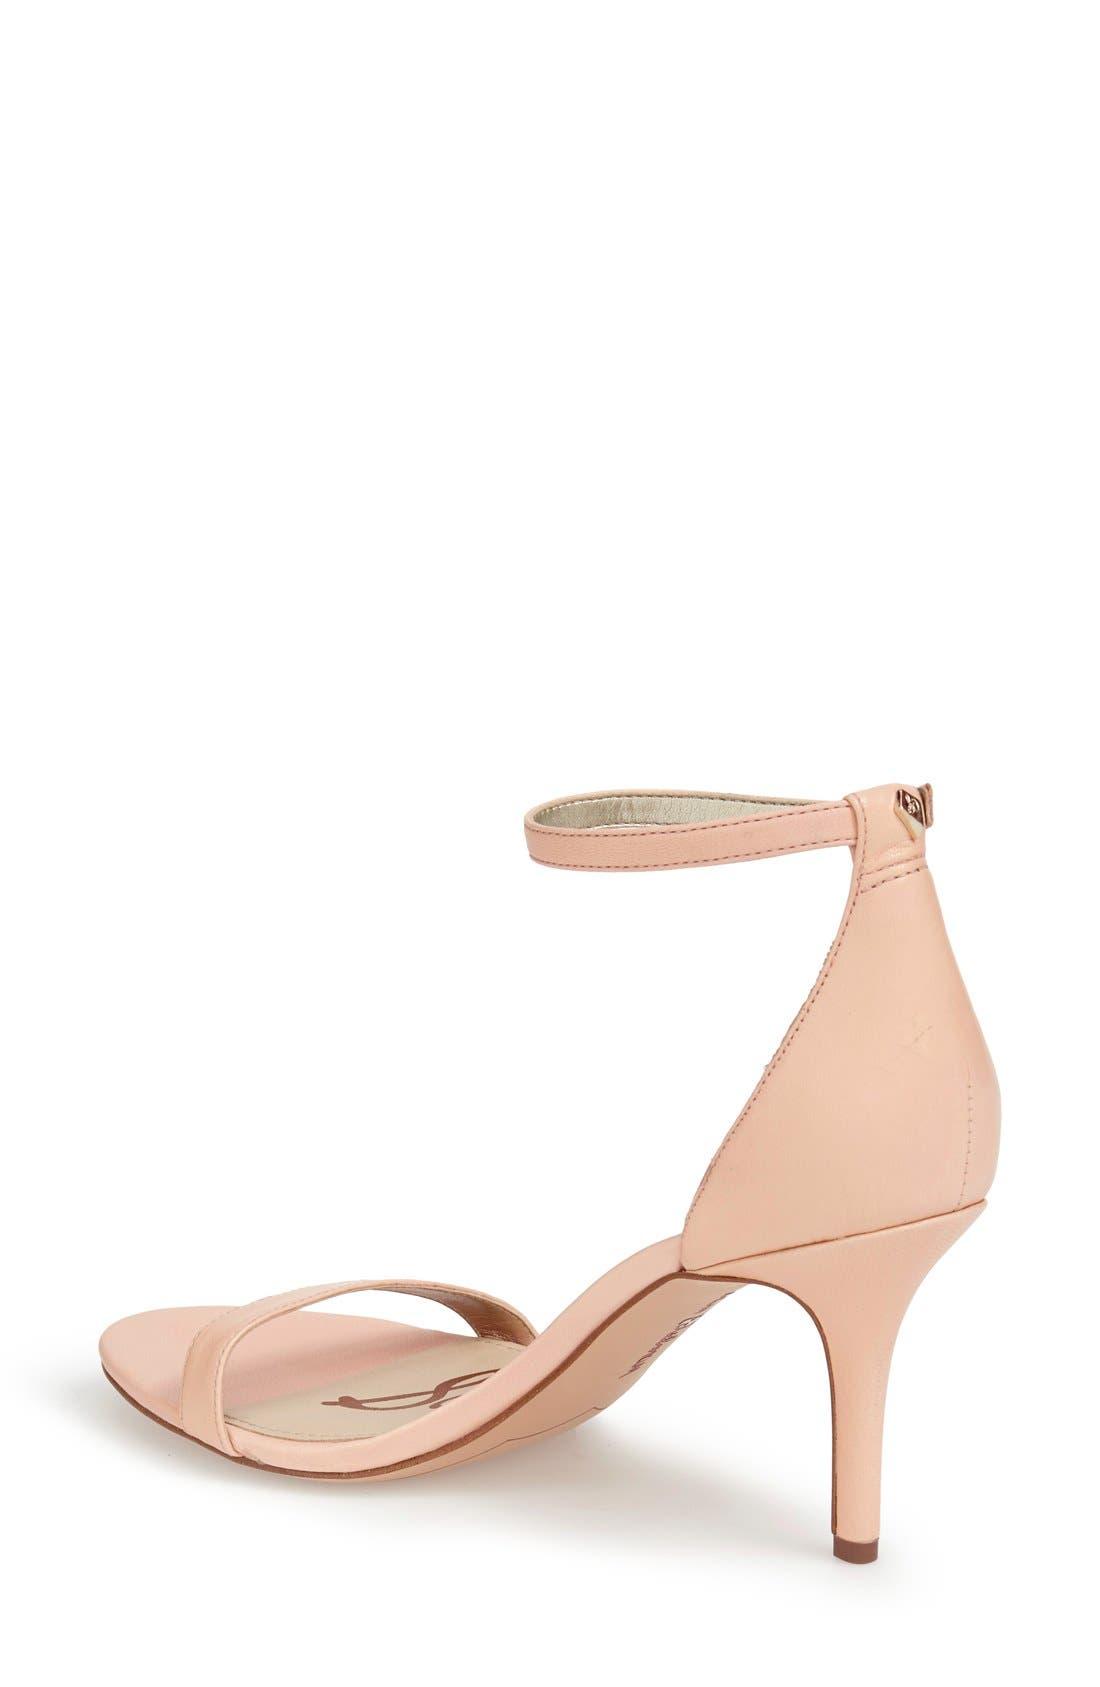 ,                             'Patti' Ankle Strap Sandal,                             Alternate thumbnail 185, color,                             253